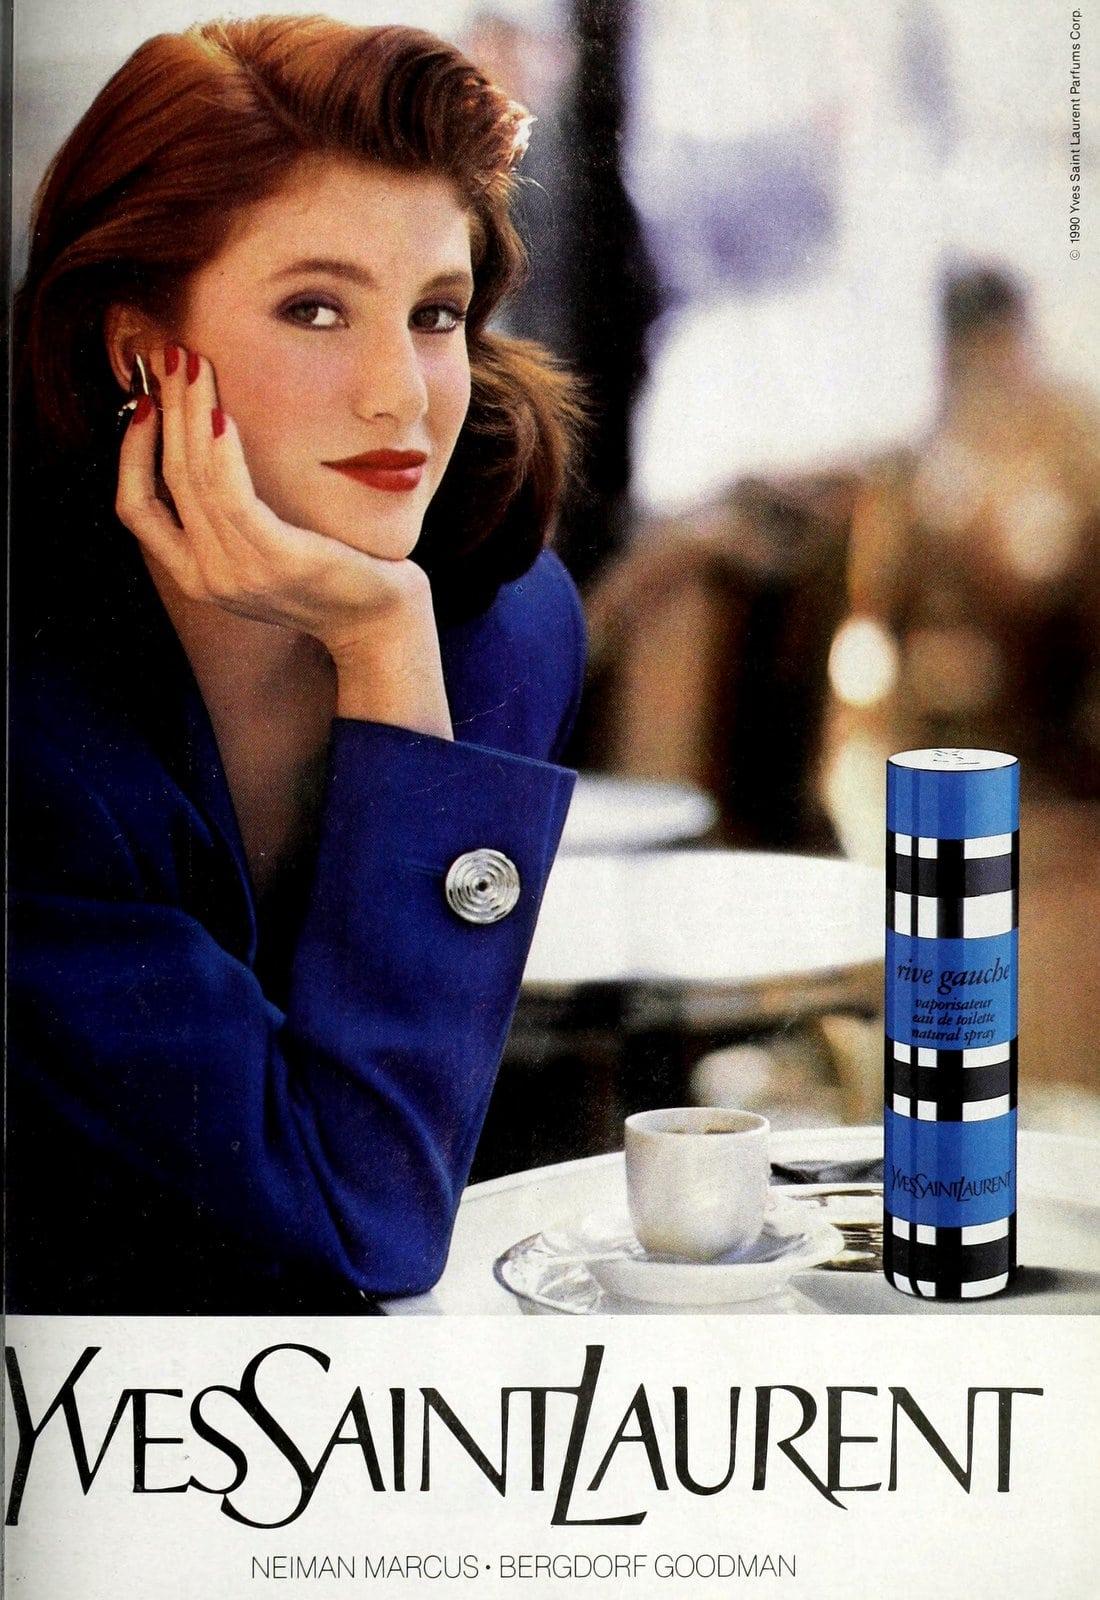 Rive Gauche perfume by Yves Saint Laurent (1990)